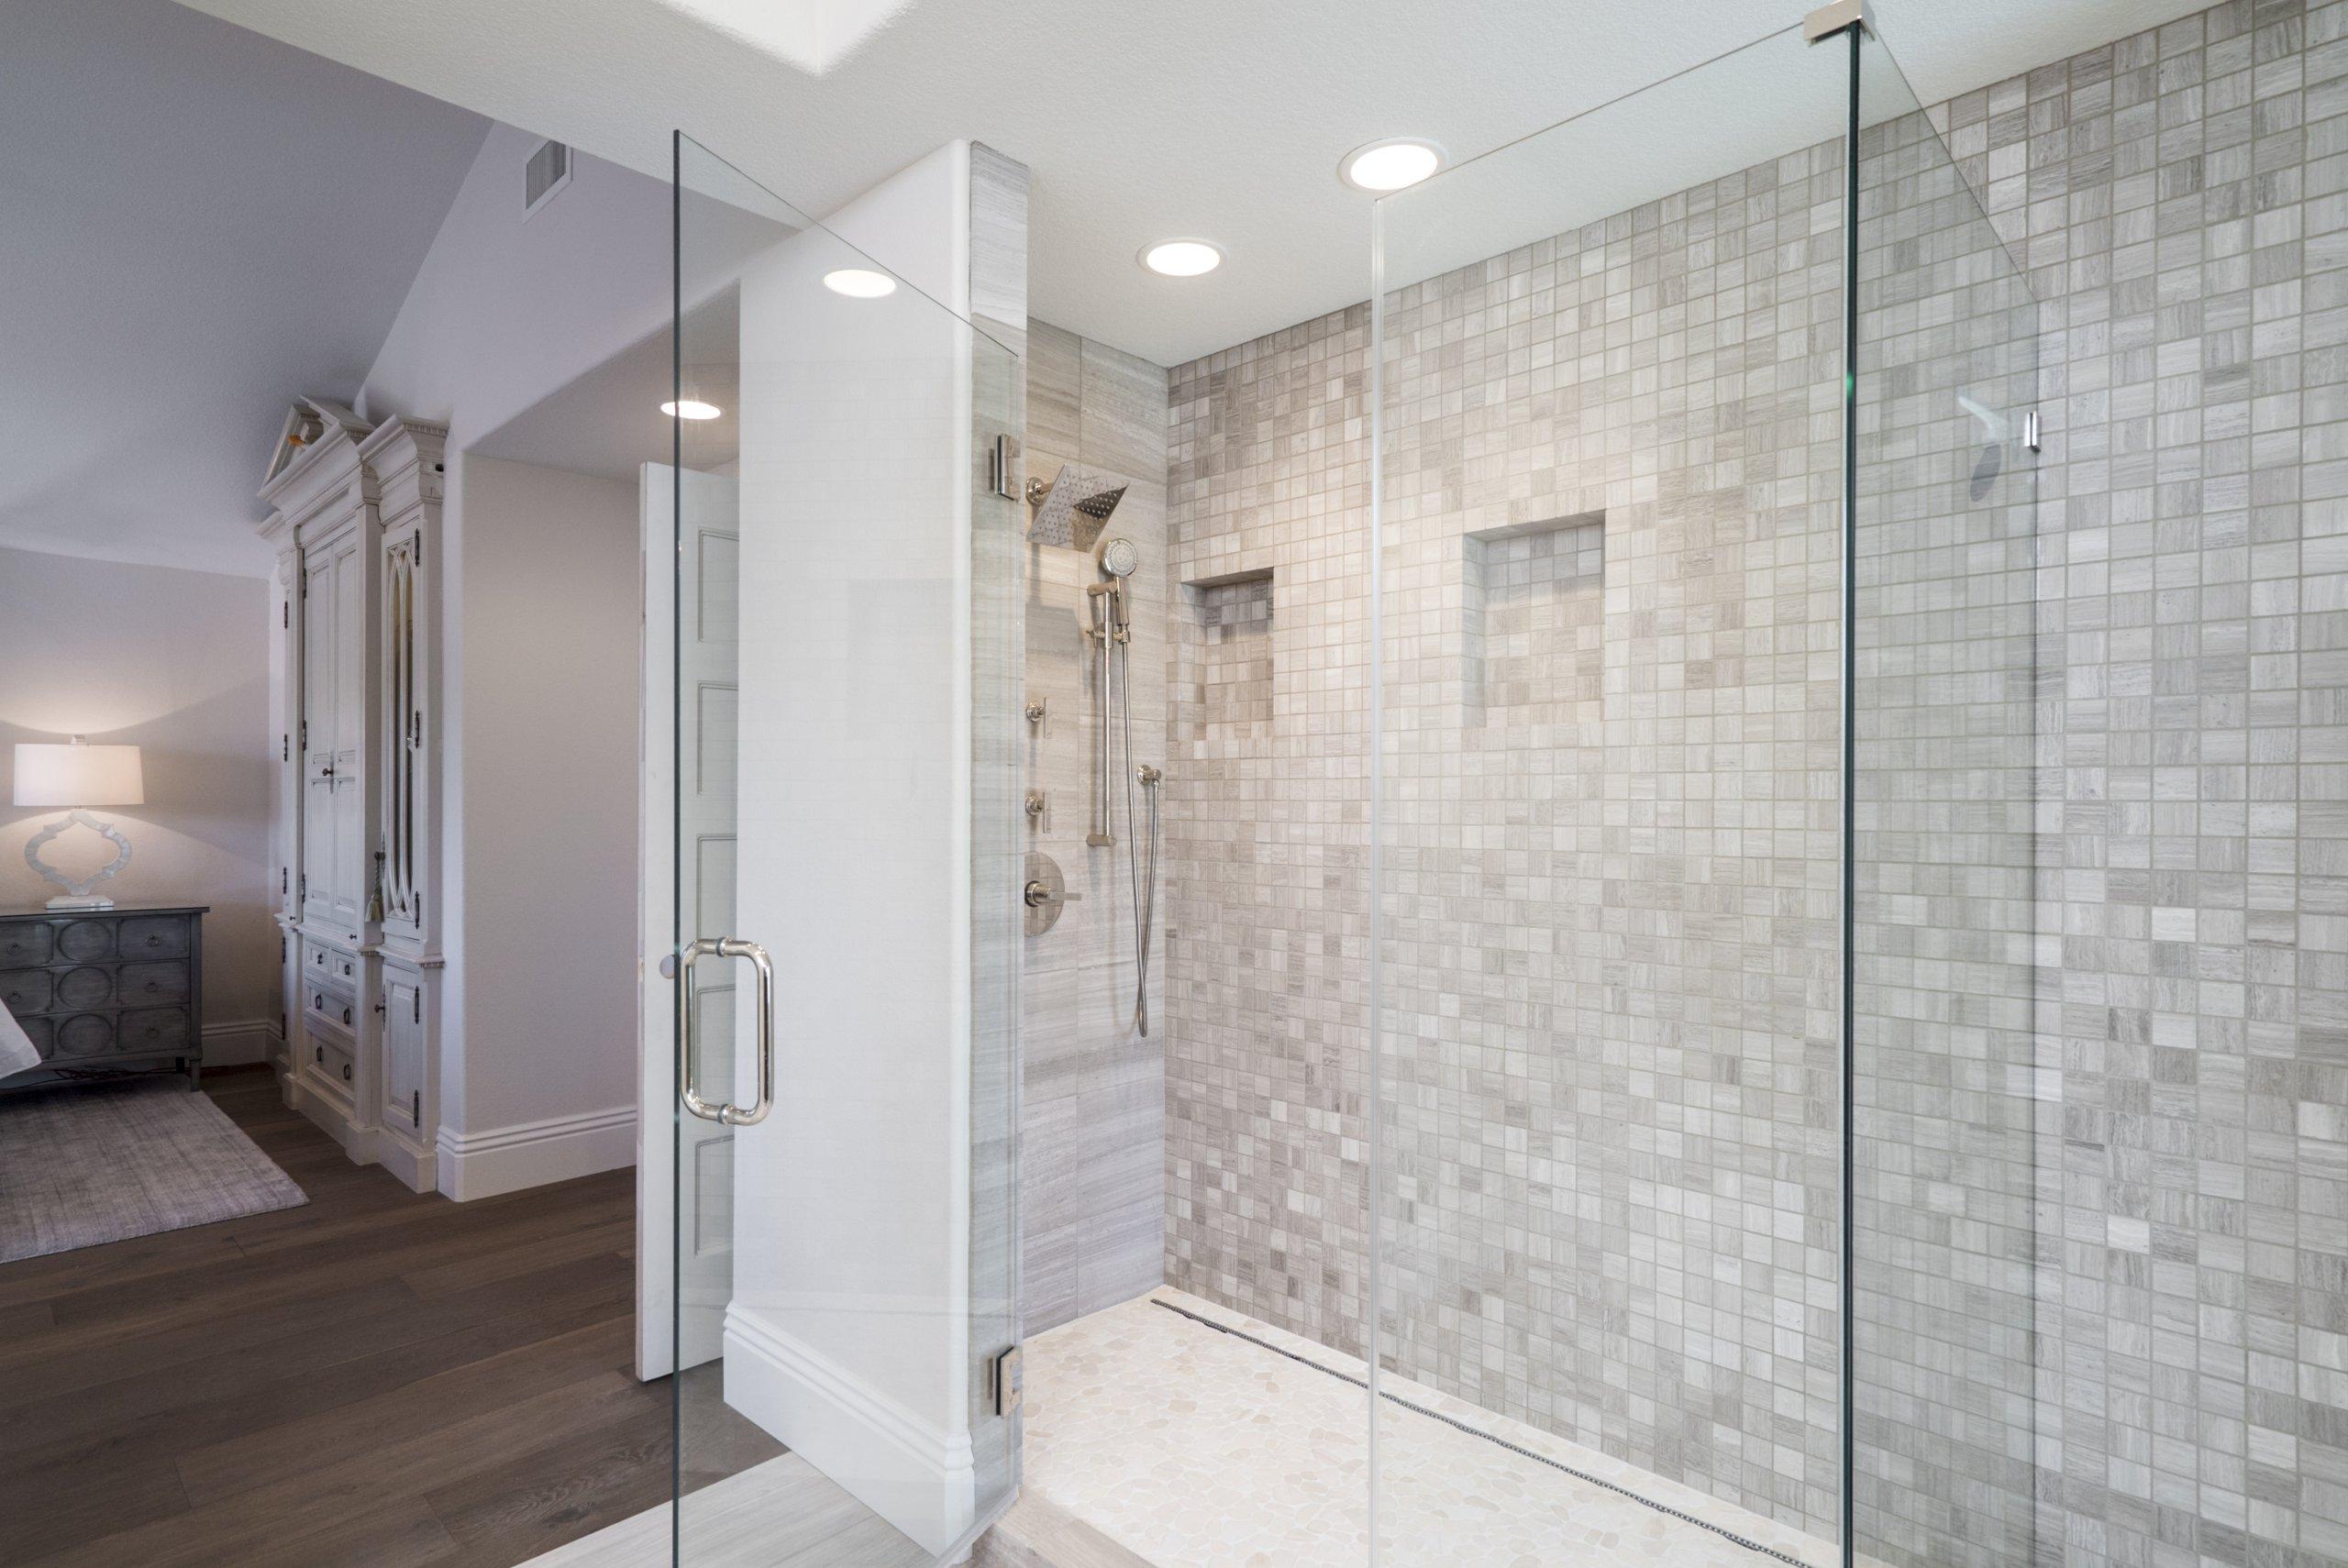 Double wide shower remodel design